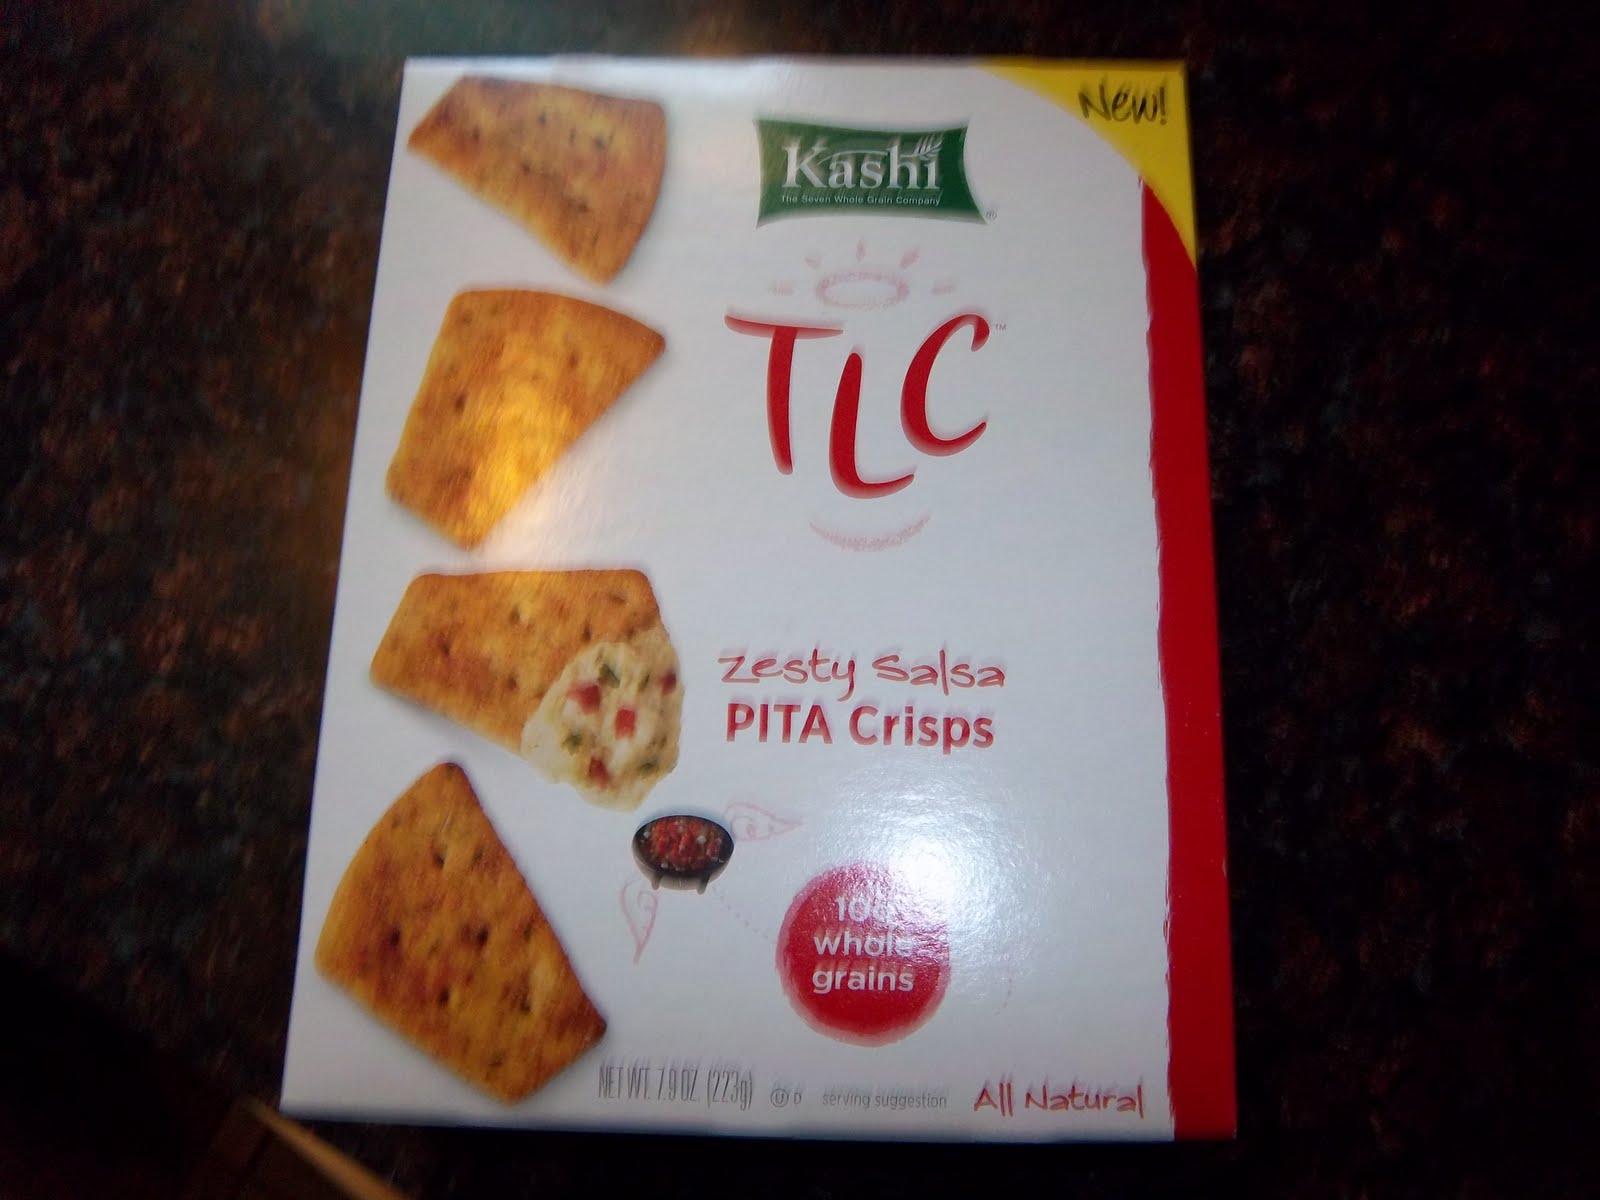 Review: Kashi TLC Pita Crisps - Zesty Salsa | If You Give A